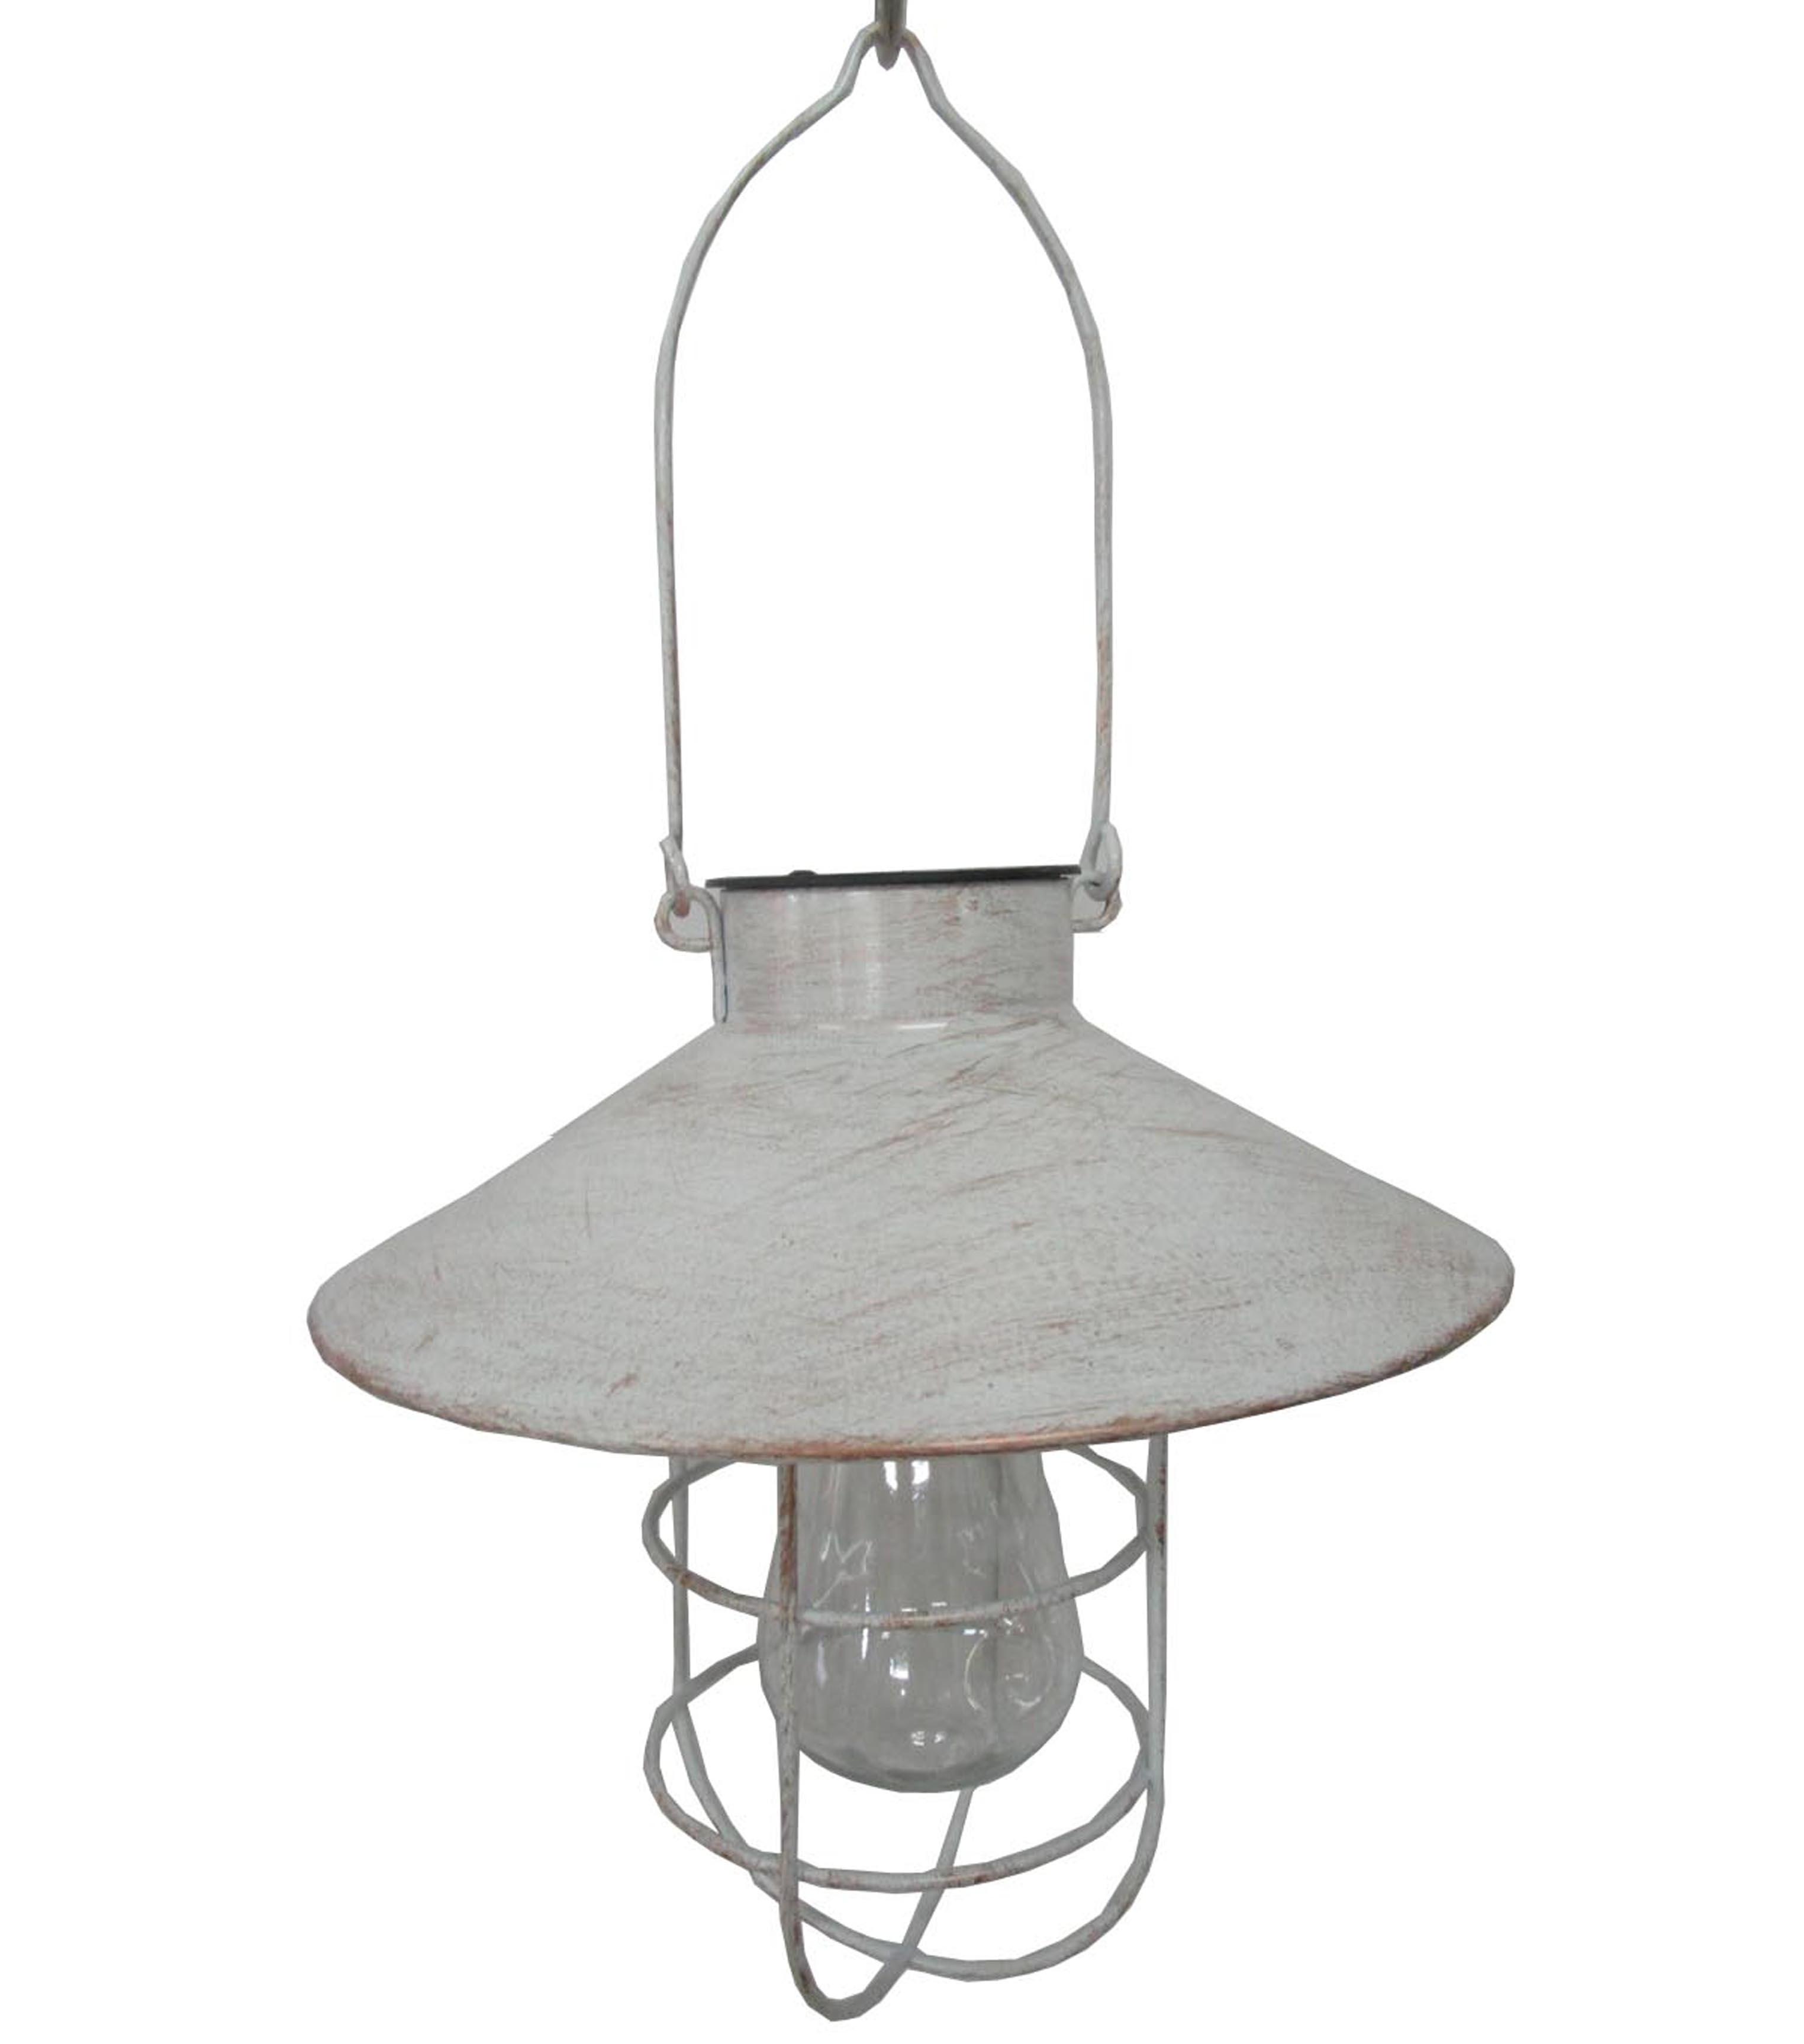 Joann Pertaining To Popular Joanns Outdoor Lanterns (View 13 of 20)